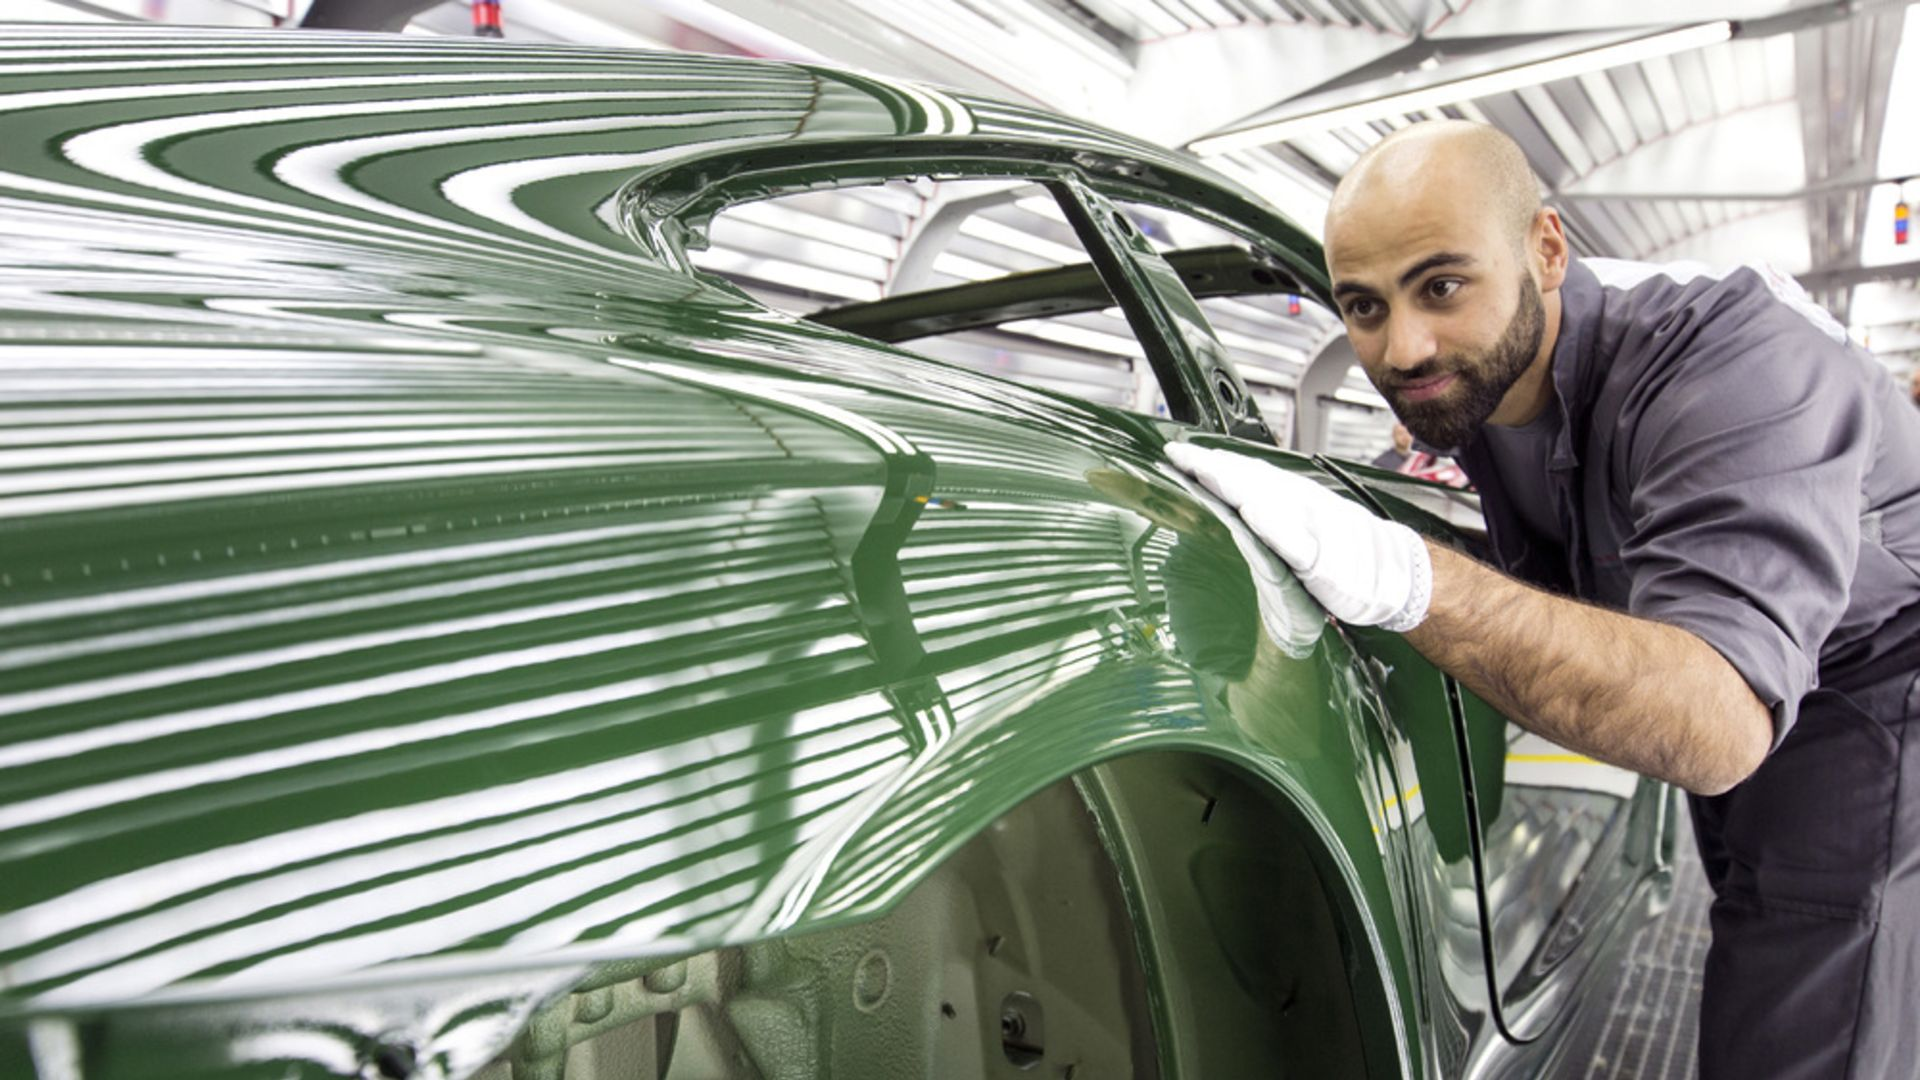 The secrets of car polishing – tip 1